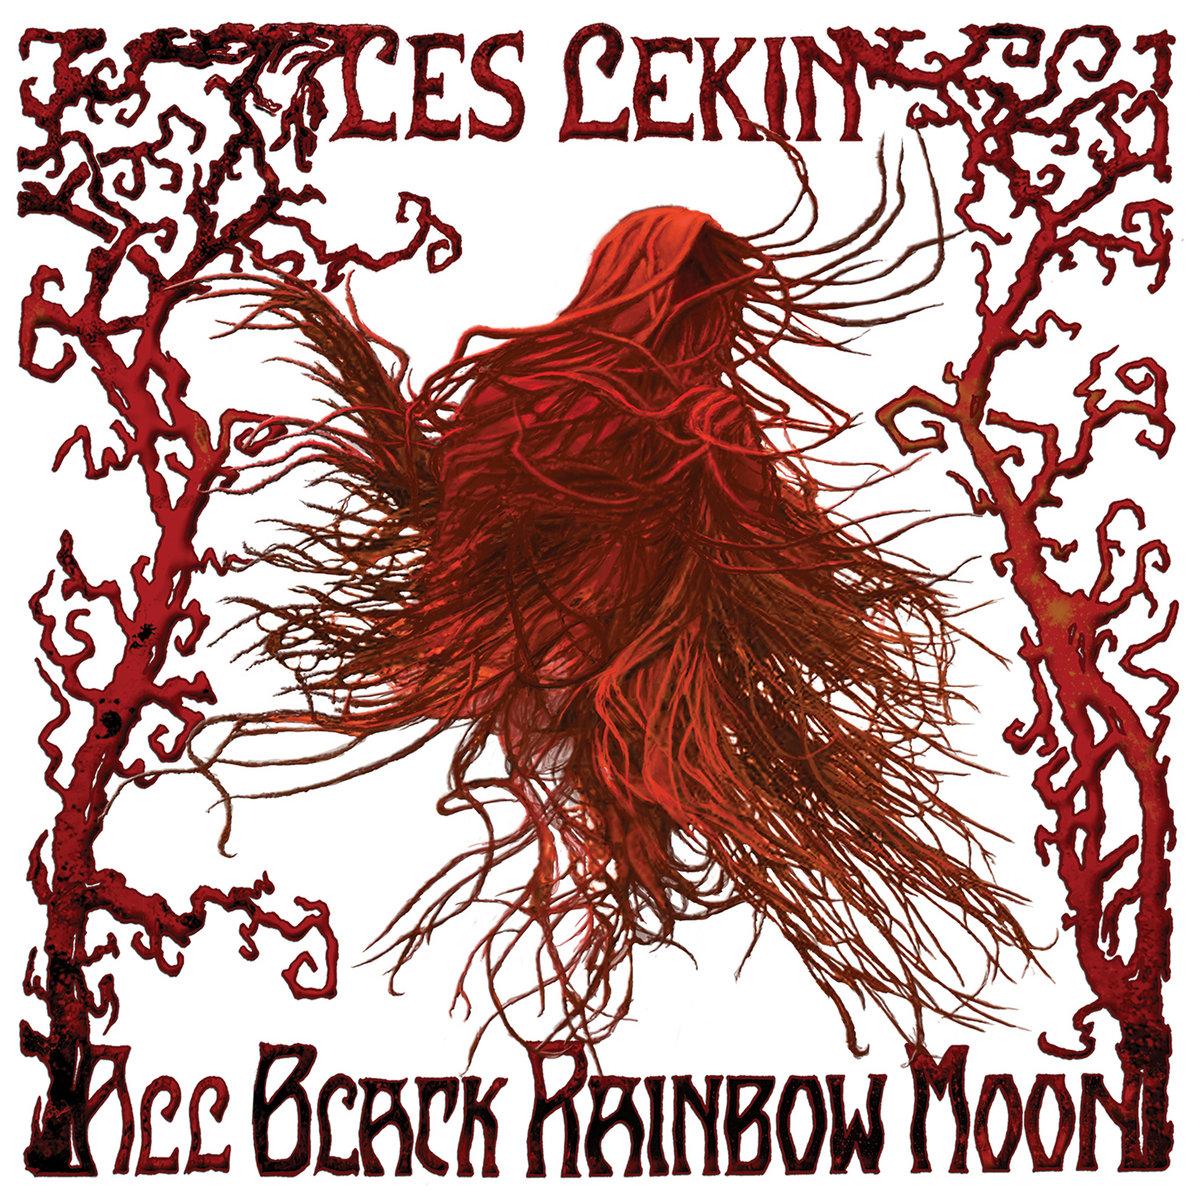 All Black Rainbow Moon | Les Lekin